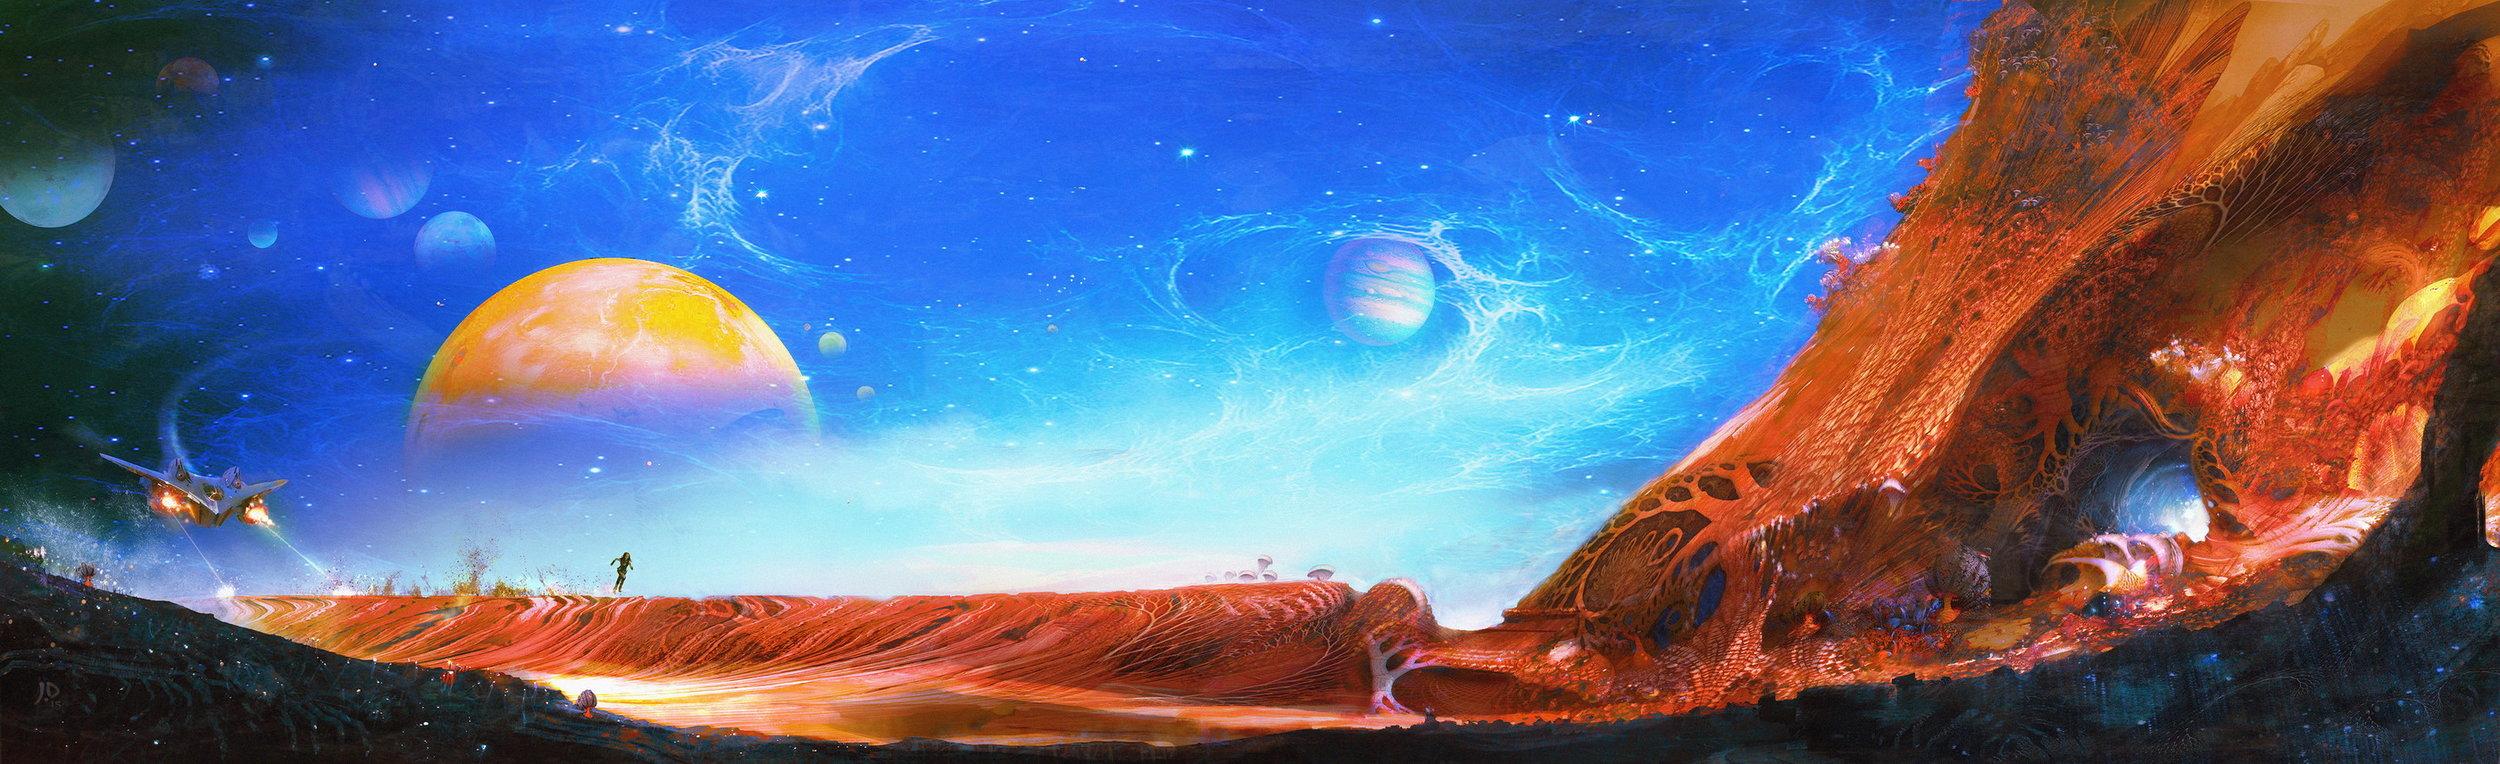 150902_ Planet_EXT _Nebula_ChasingGamora_CAVEentrance_151101_V_006_jD.jpg